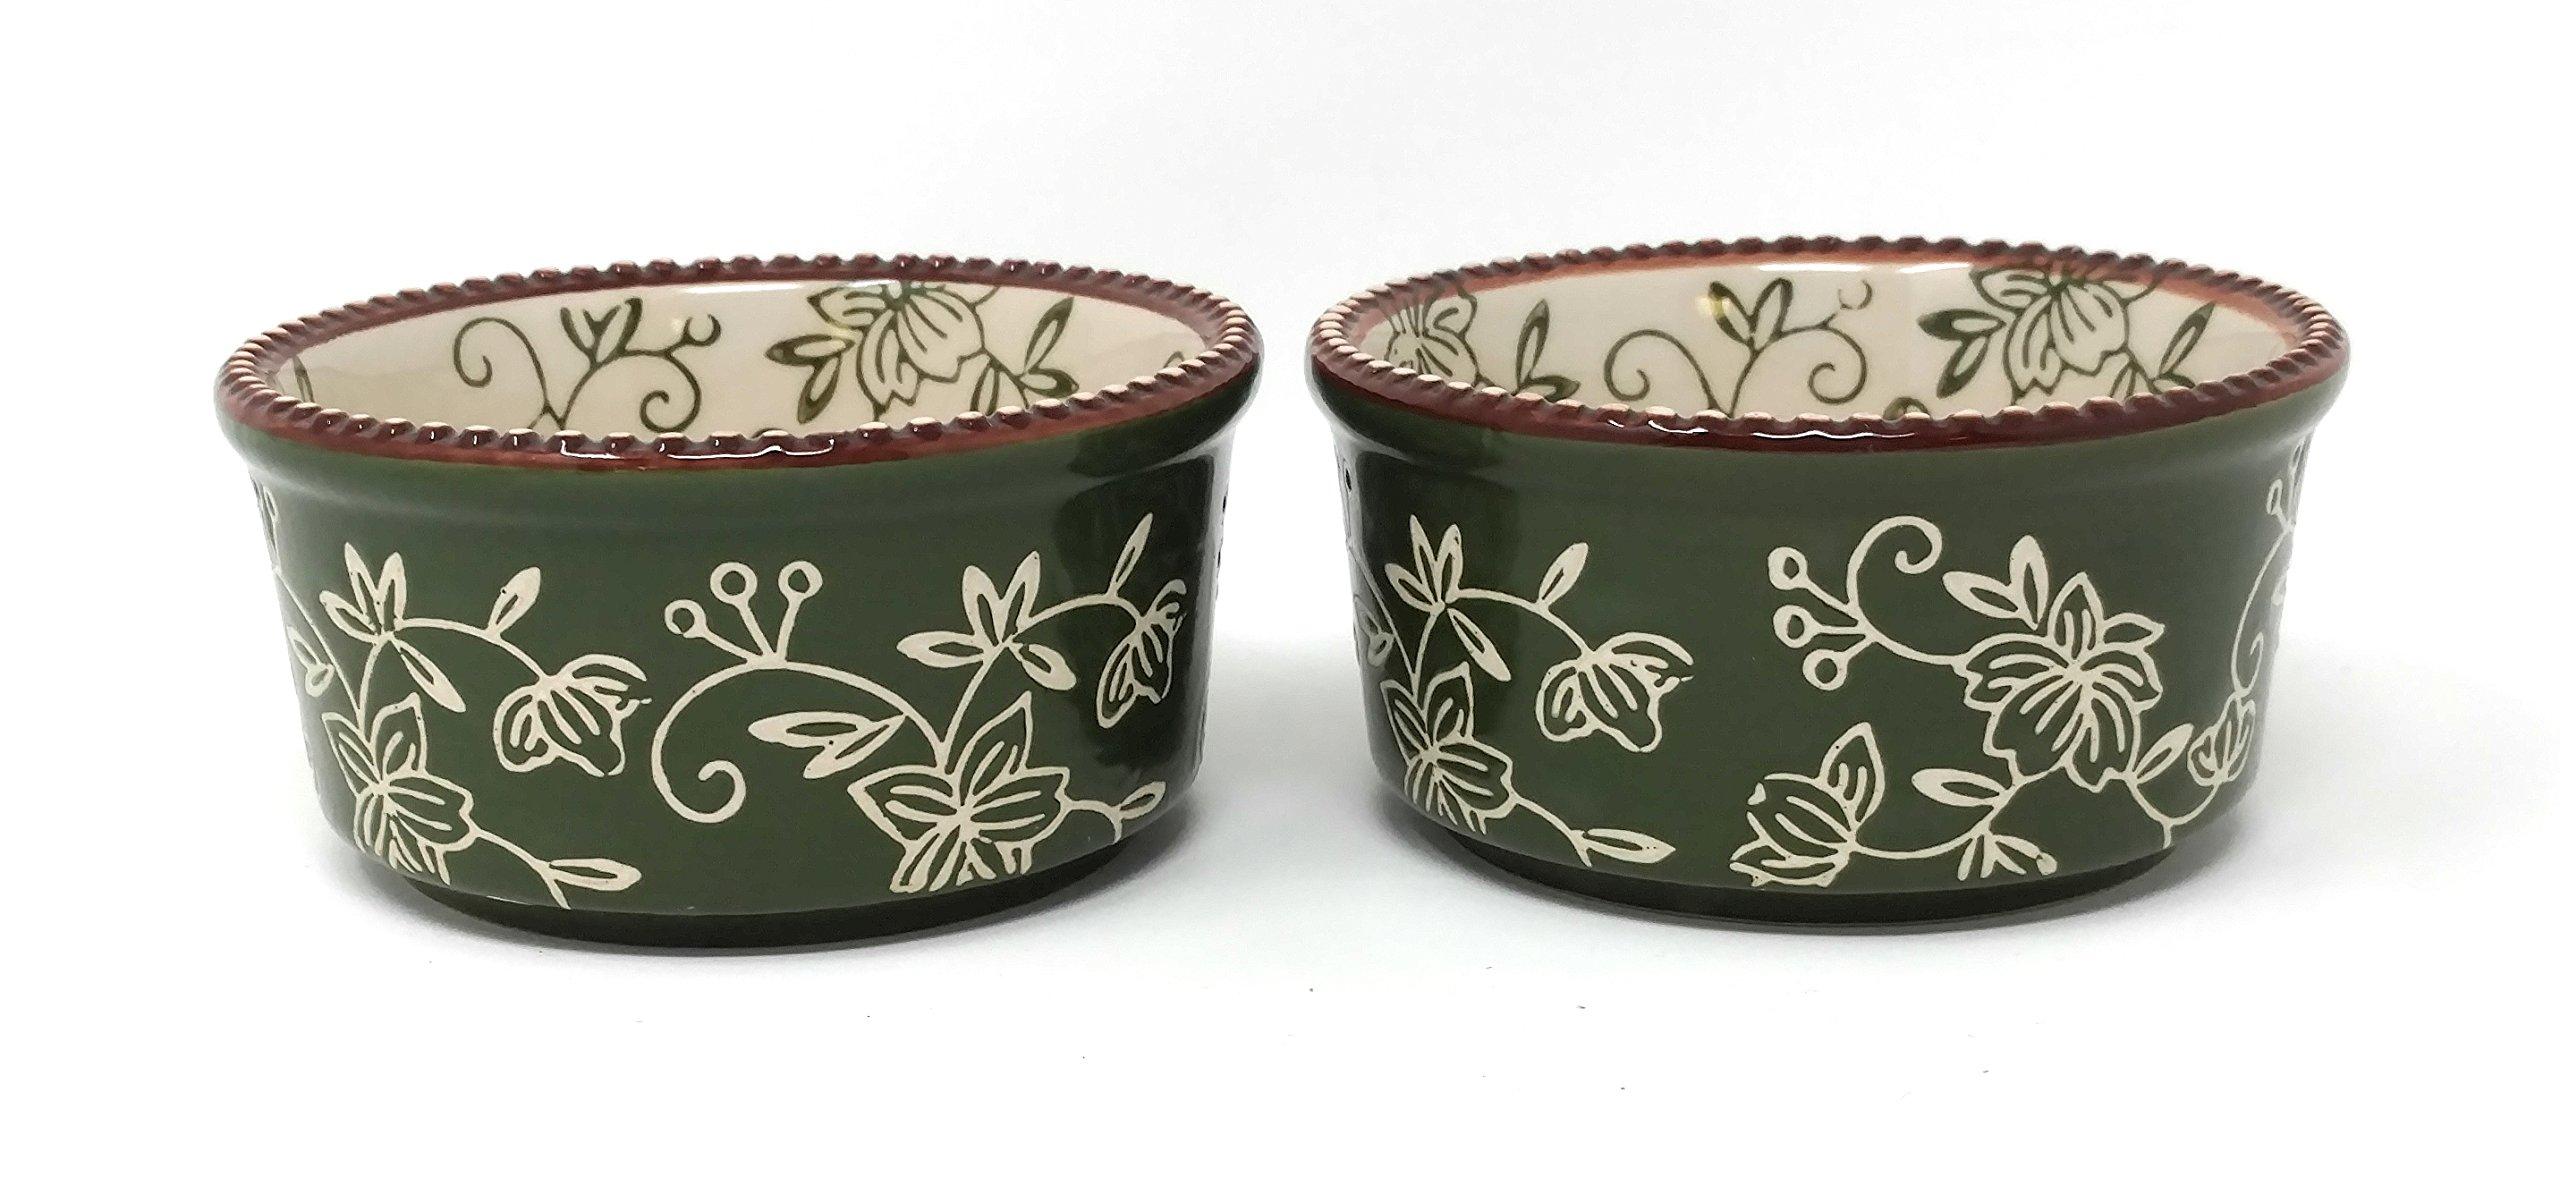 Temp-tations Set of 2 Ramekins w/Covers 6oz Single Serving (Floral Lace Green)